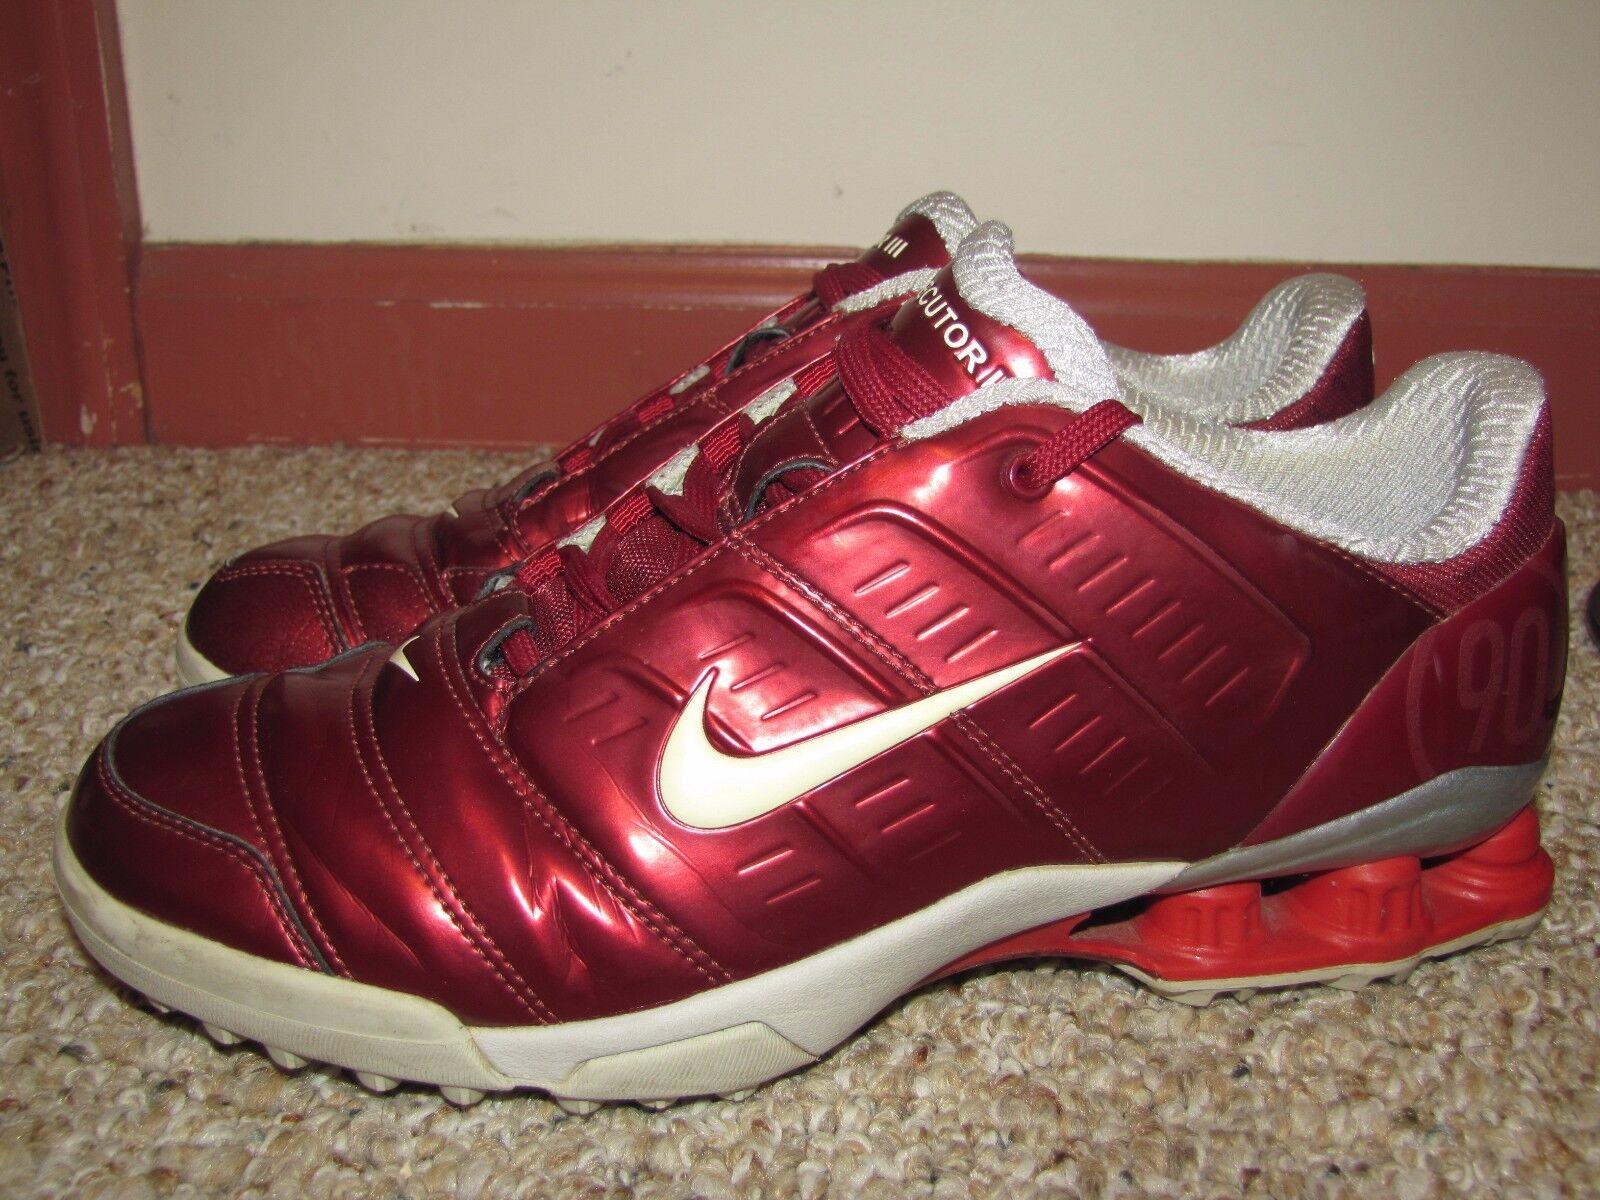 Nike Shox Secutor III Fútbol Tacos Zapatos Interiores Zapatillas Us 9 8